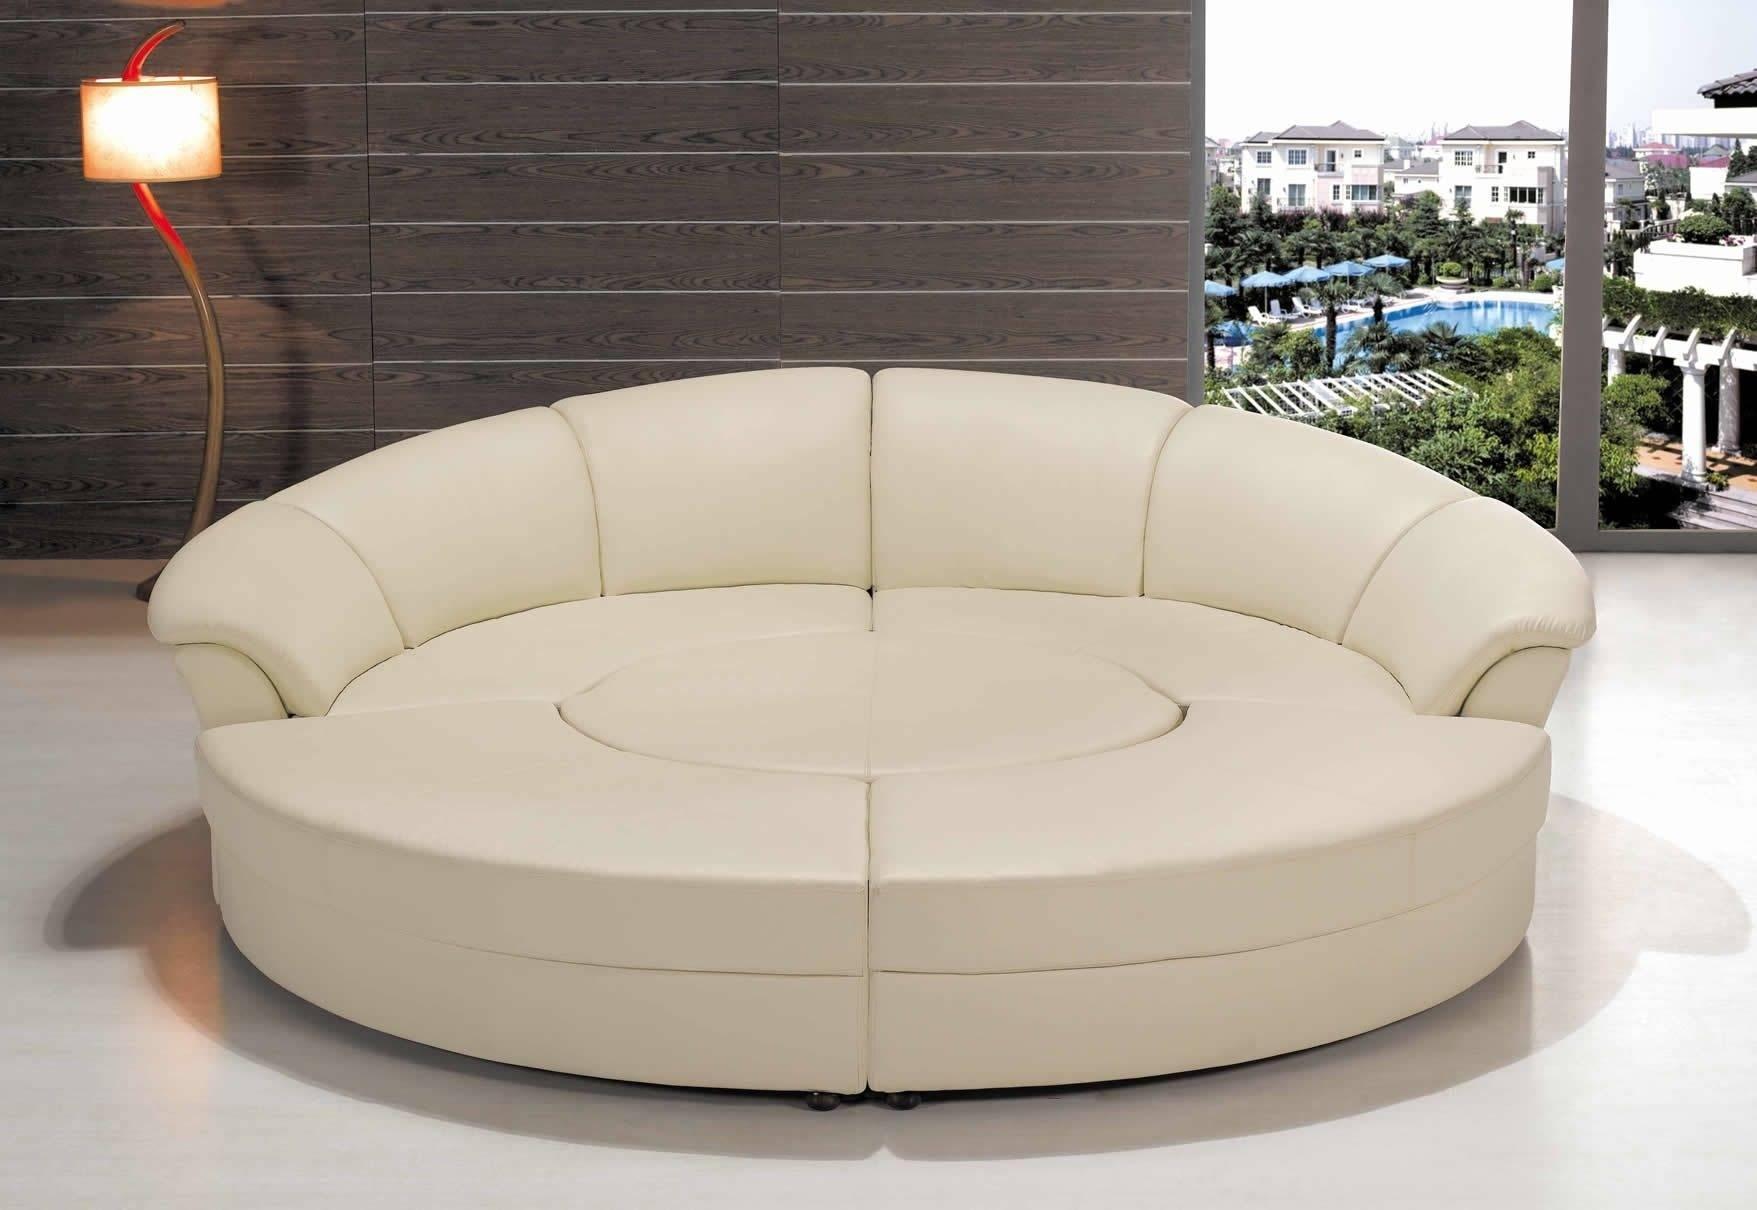 2017 Best of Circle Sofas